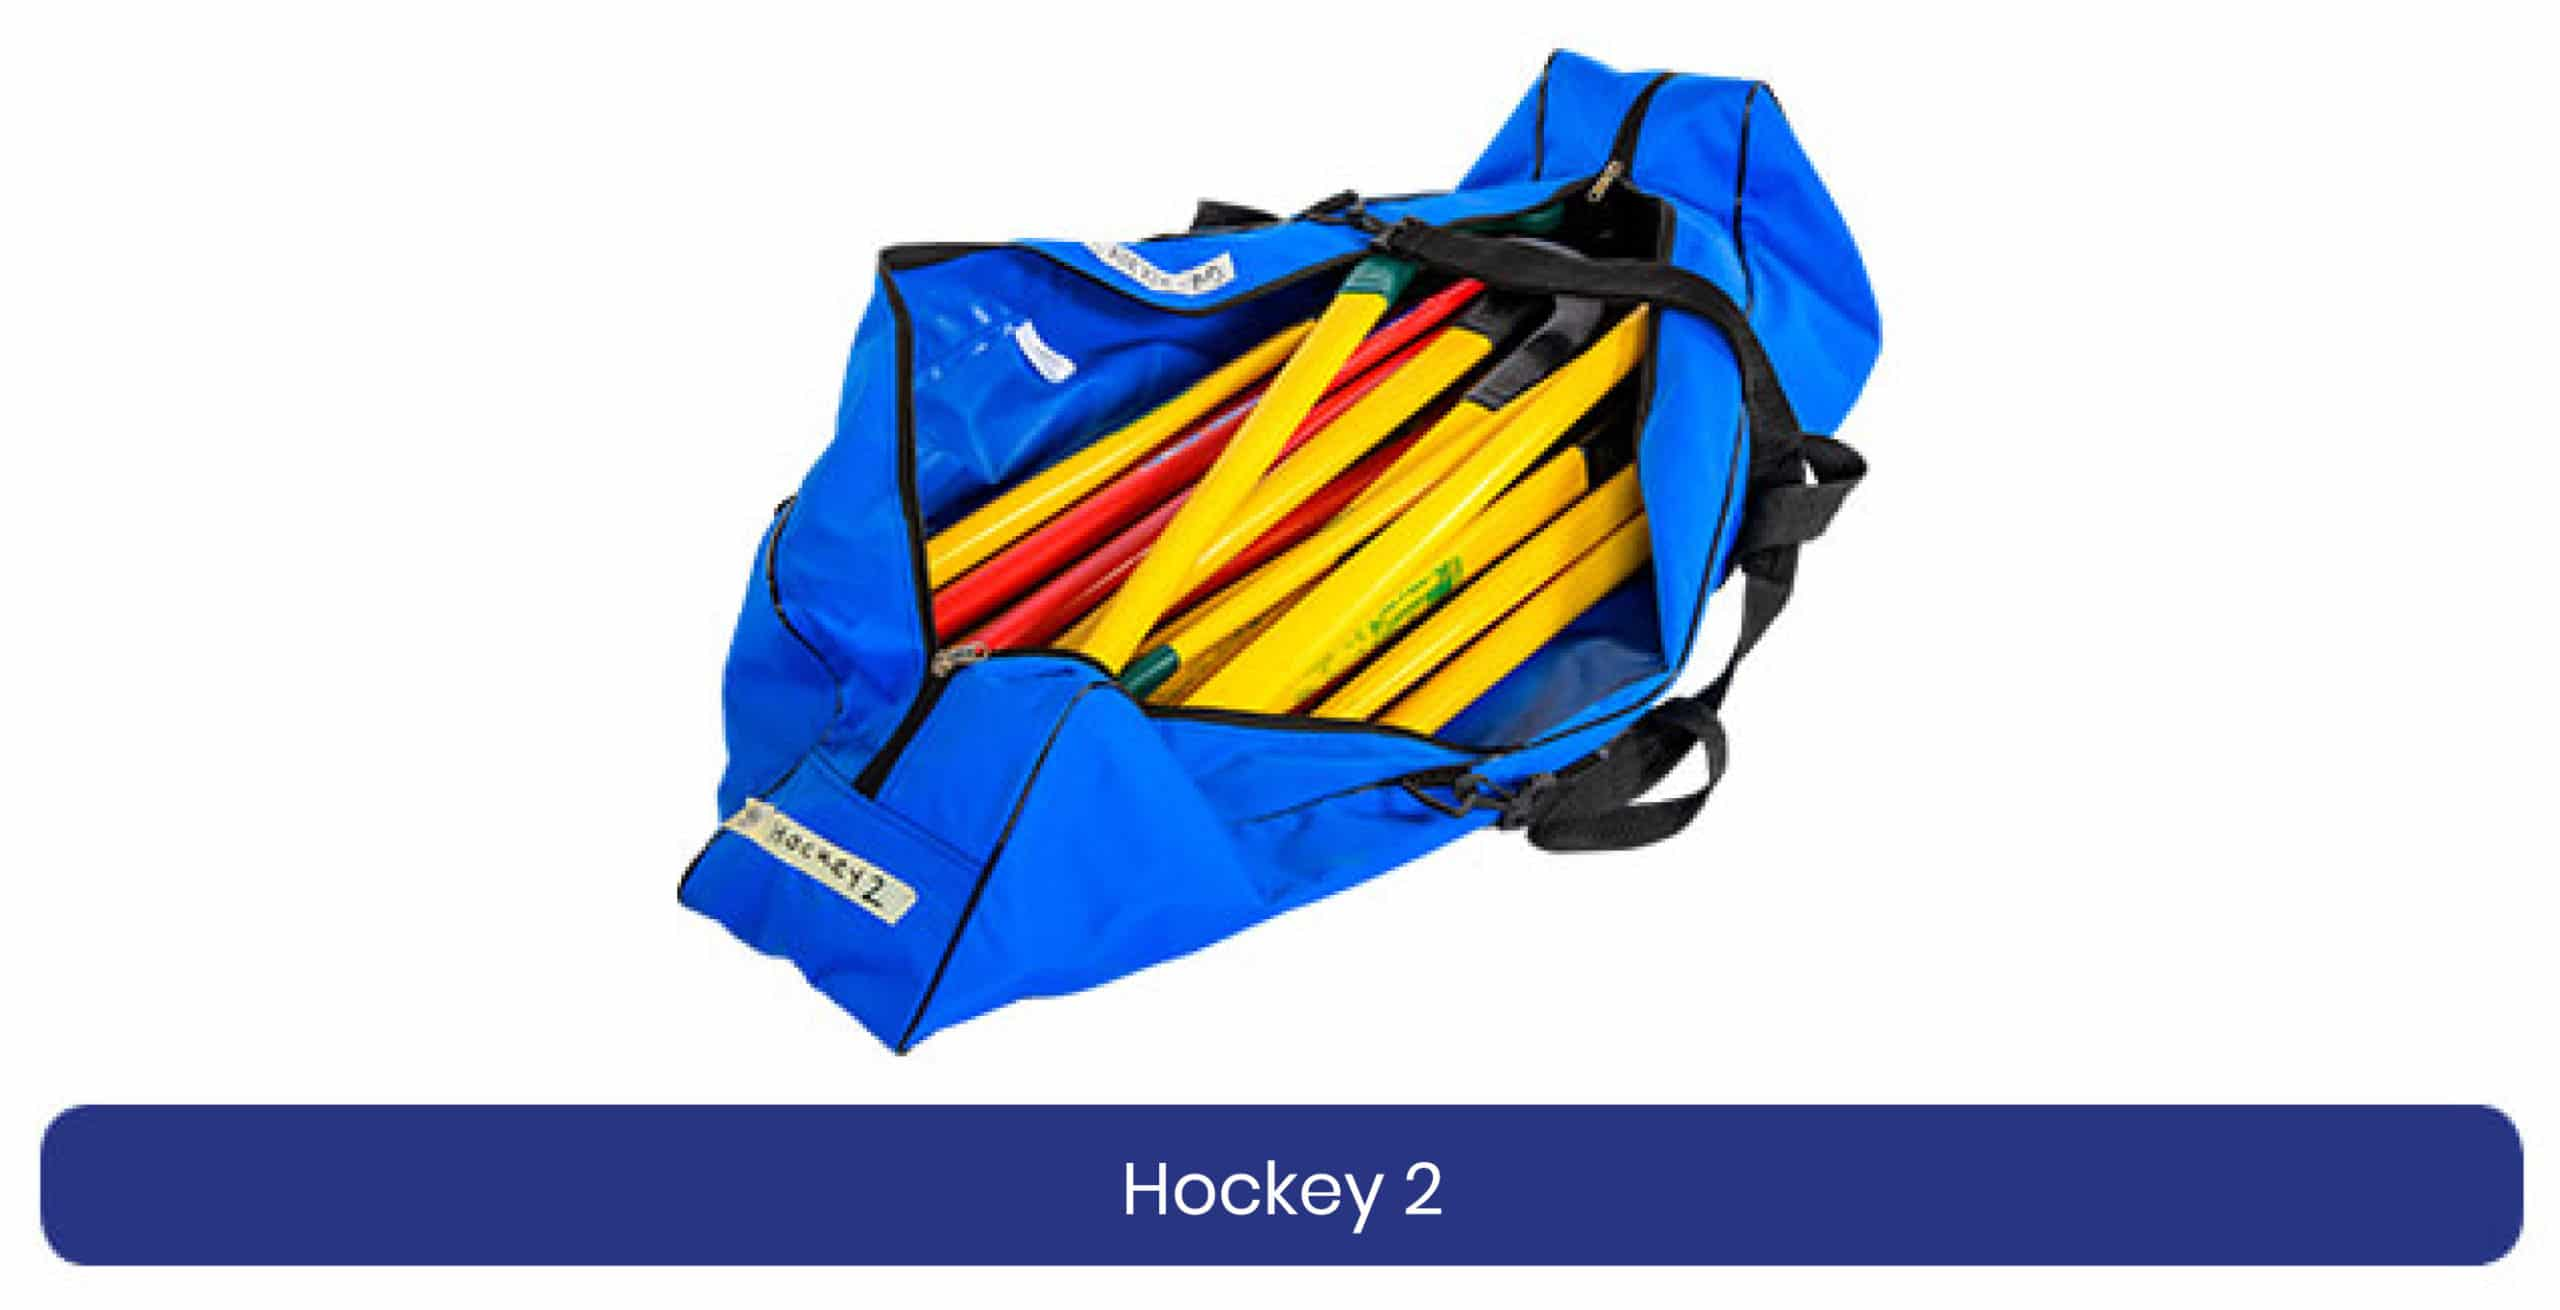 Hockey 2 lenen product